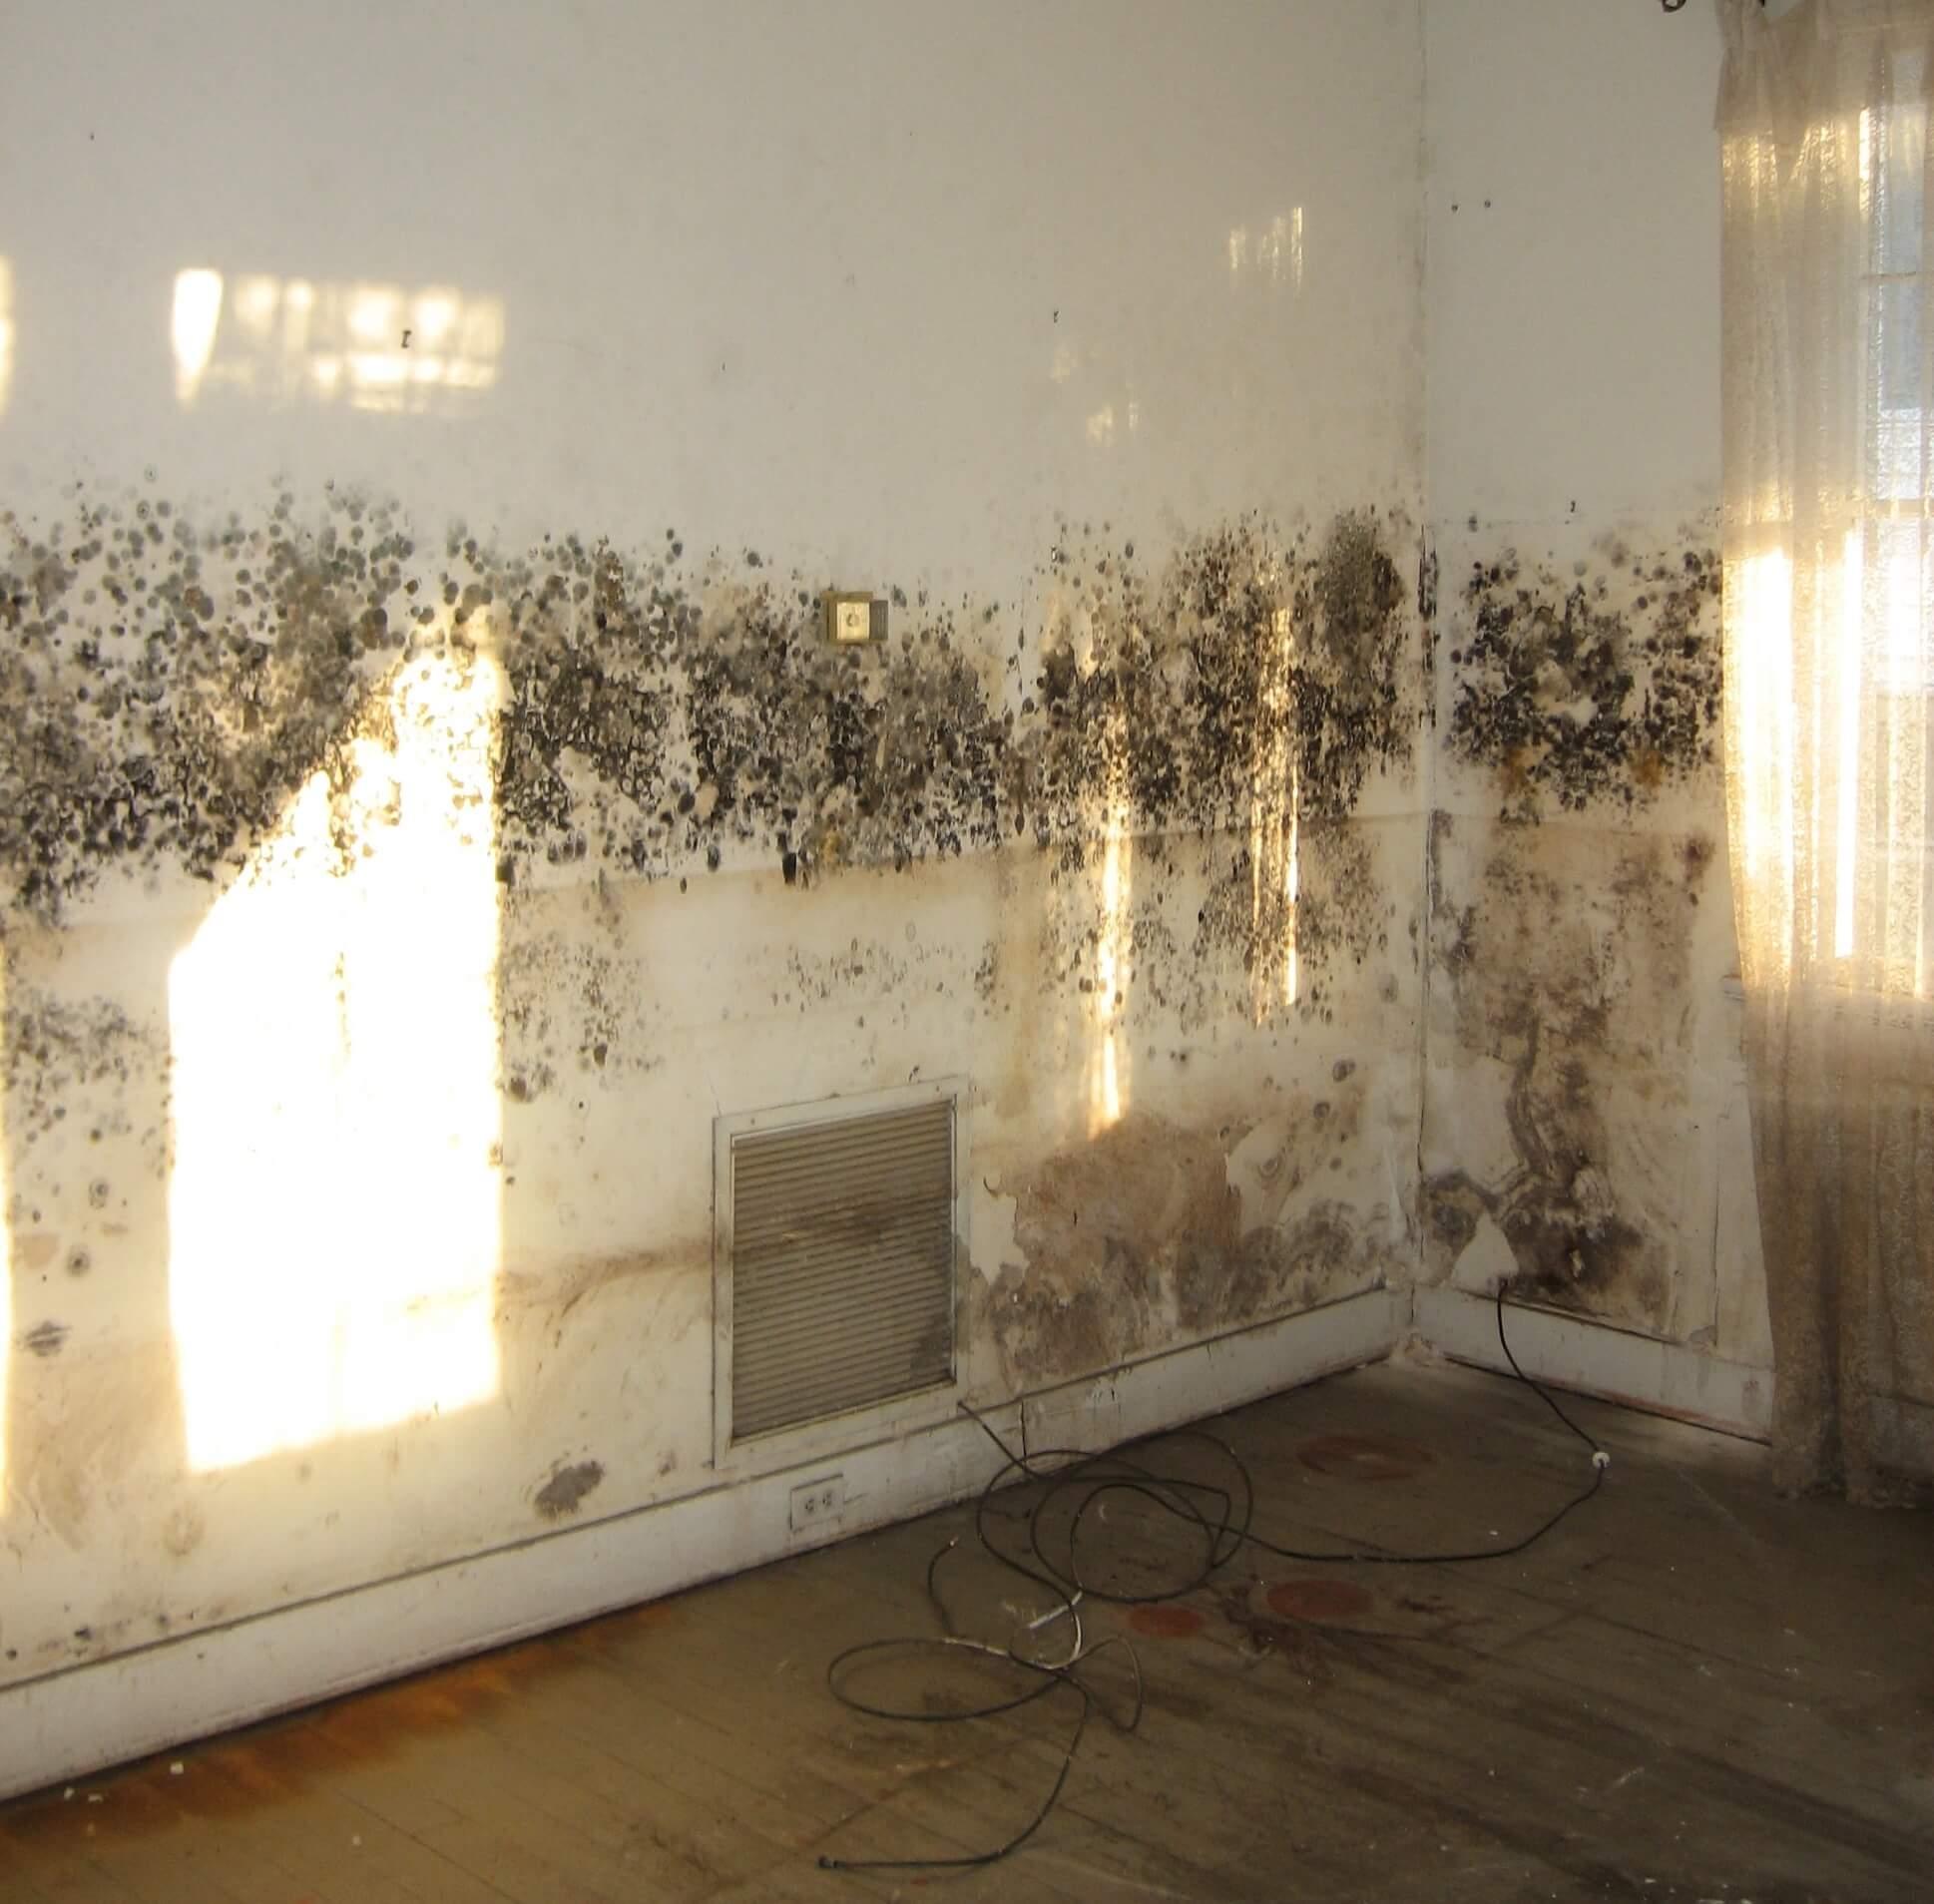 Mould on interior walls